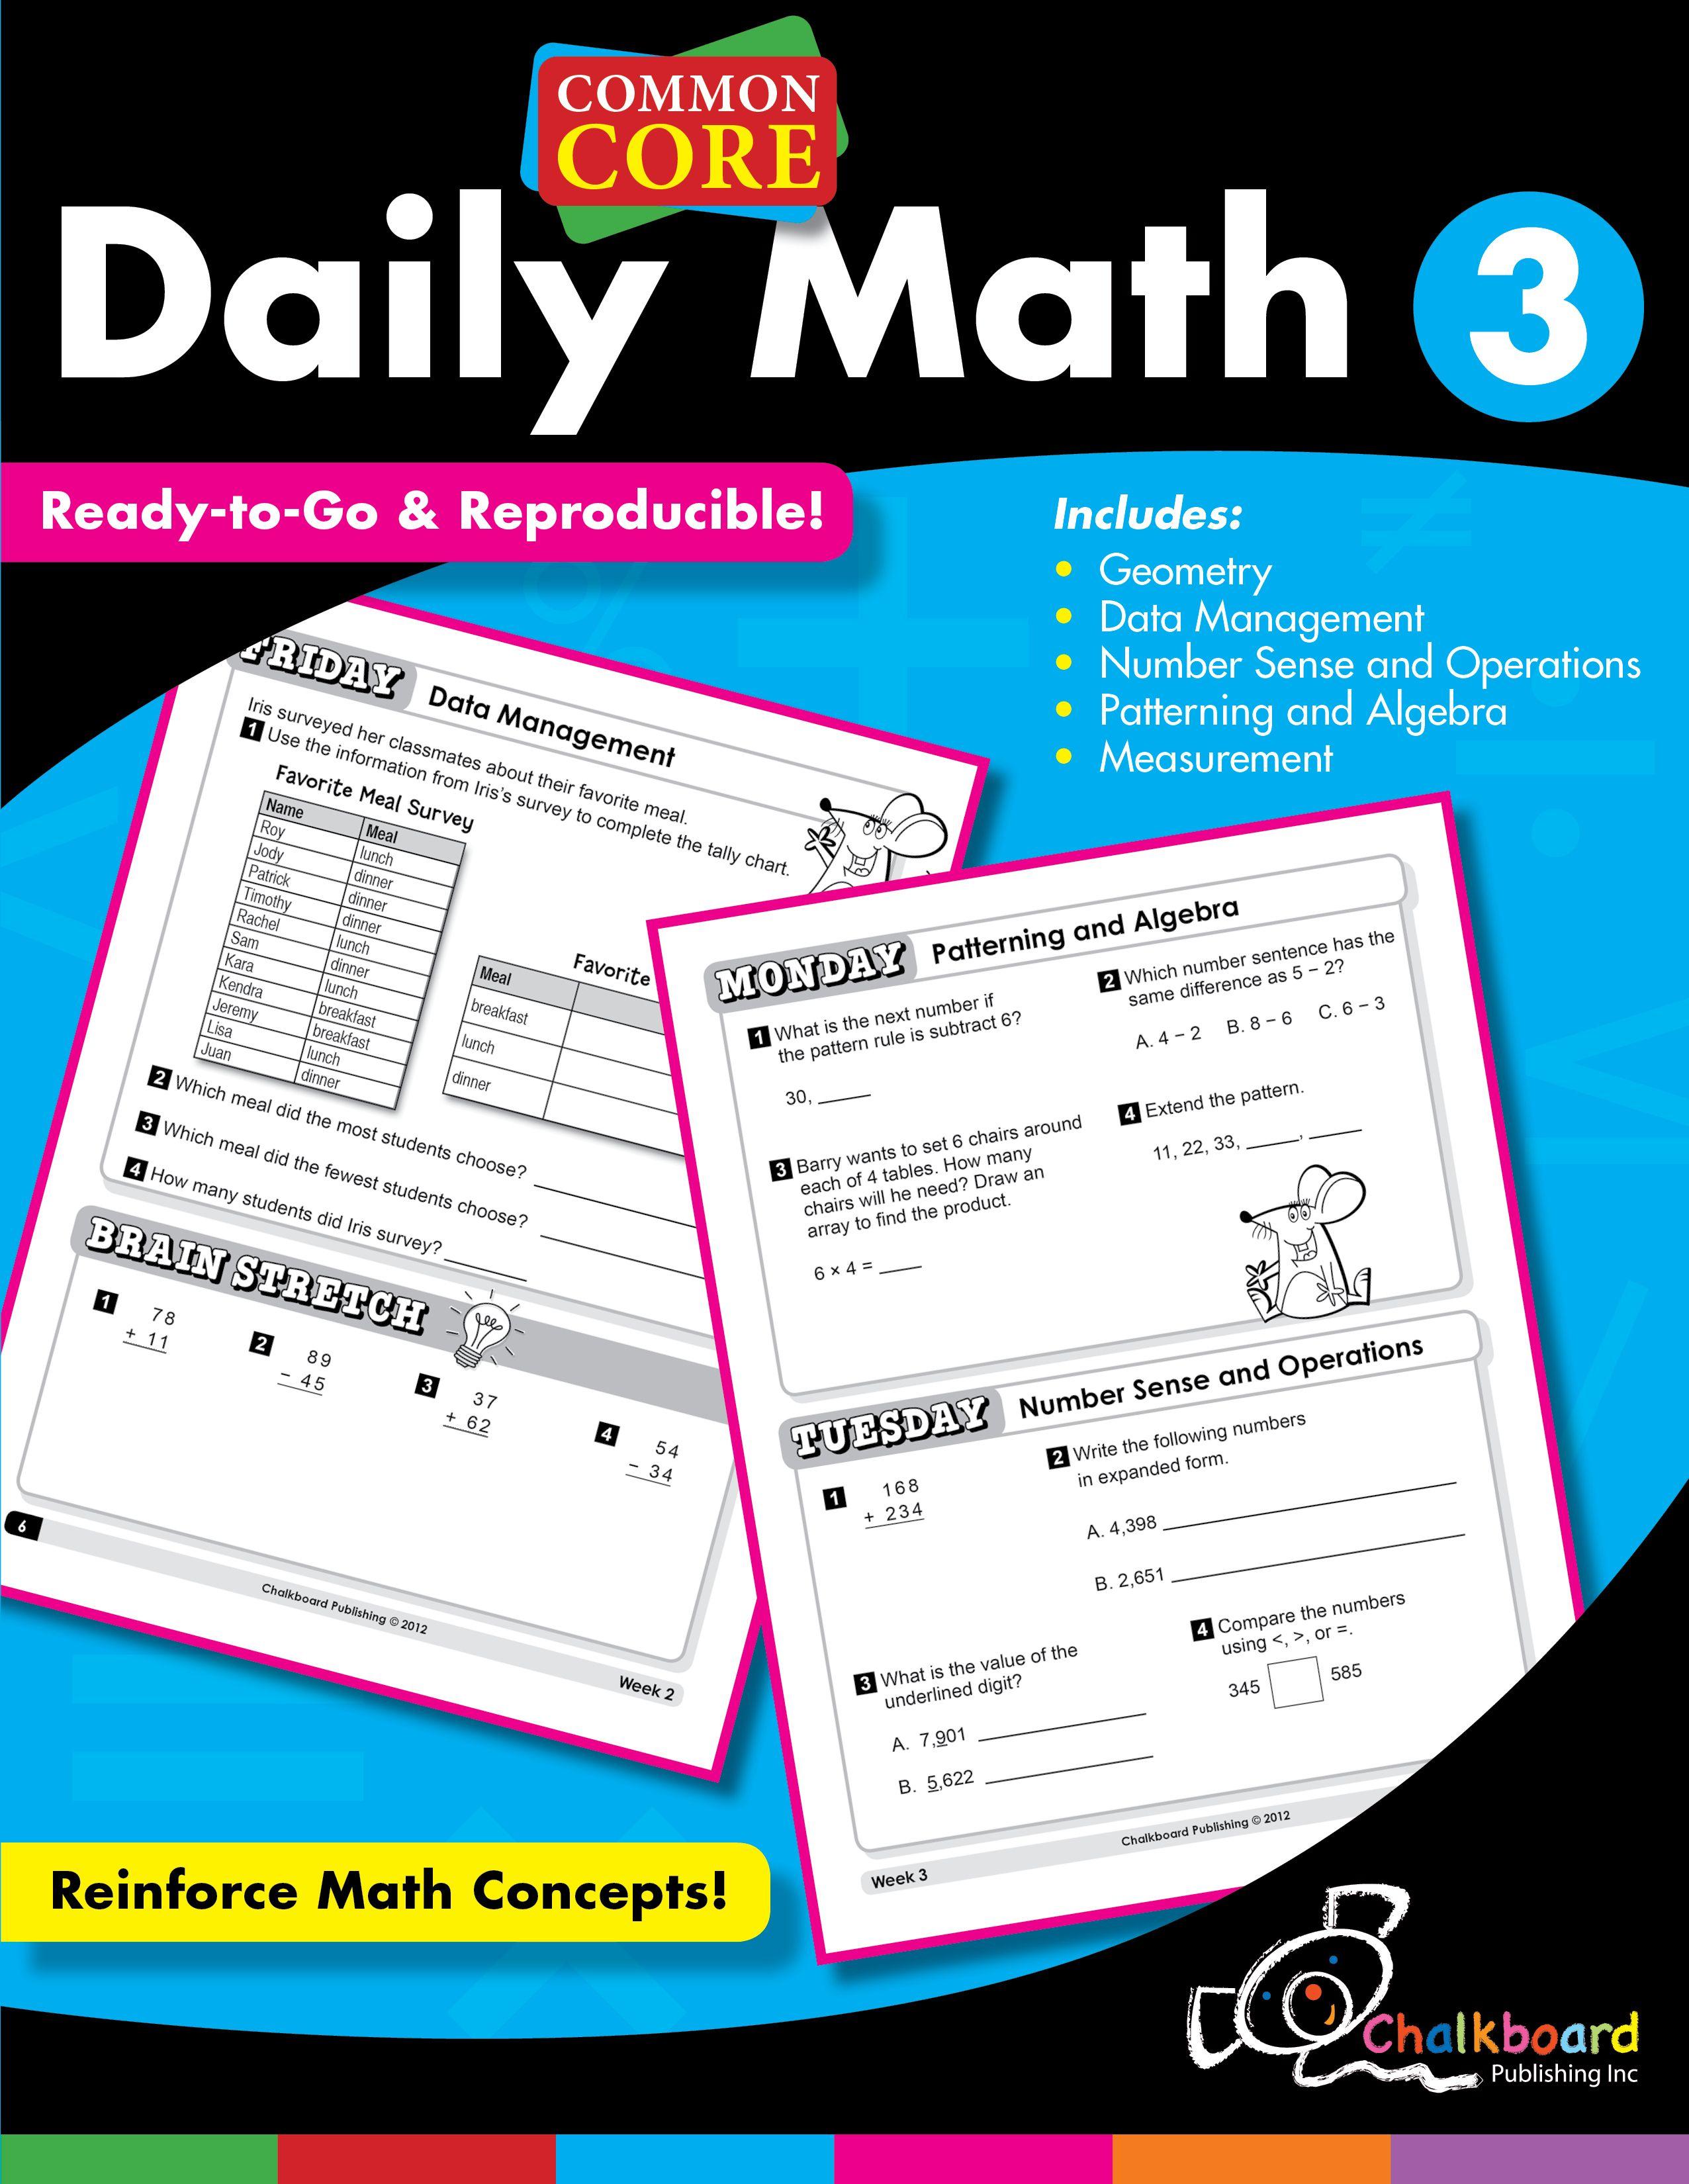 Daily Math 3